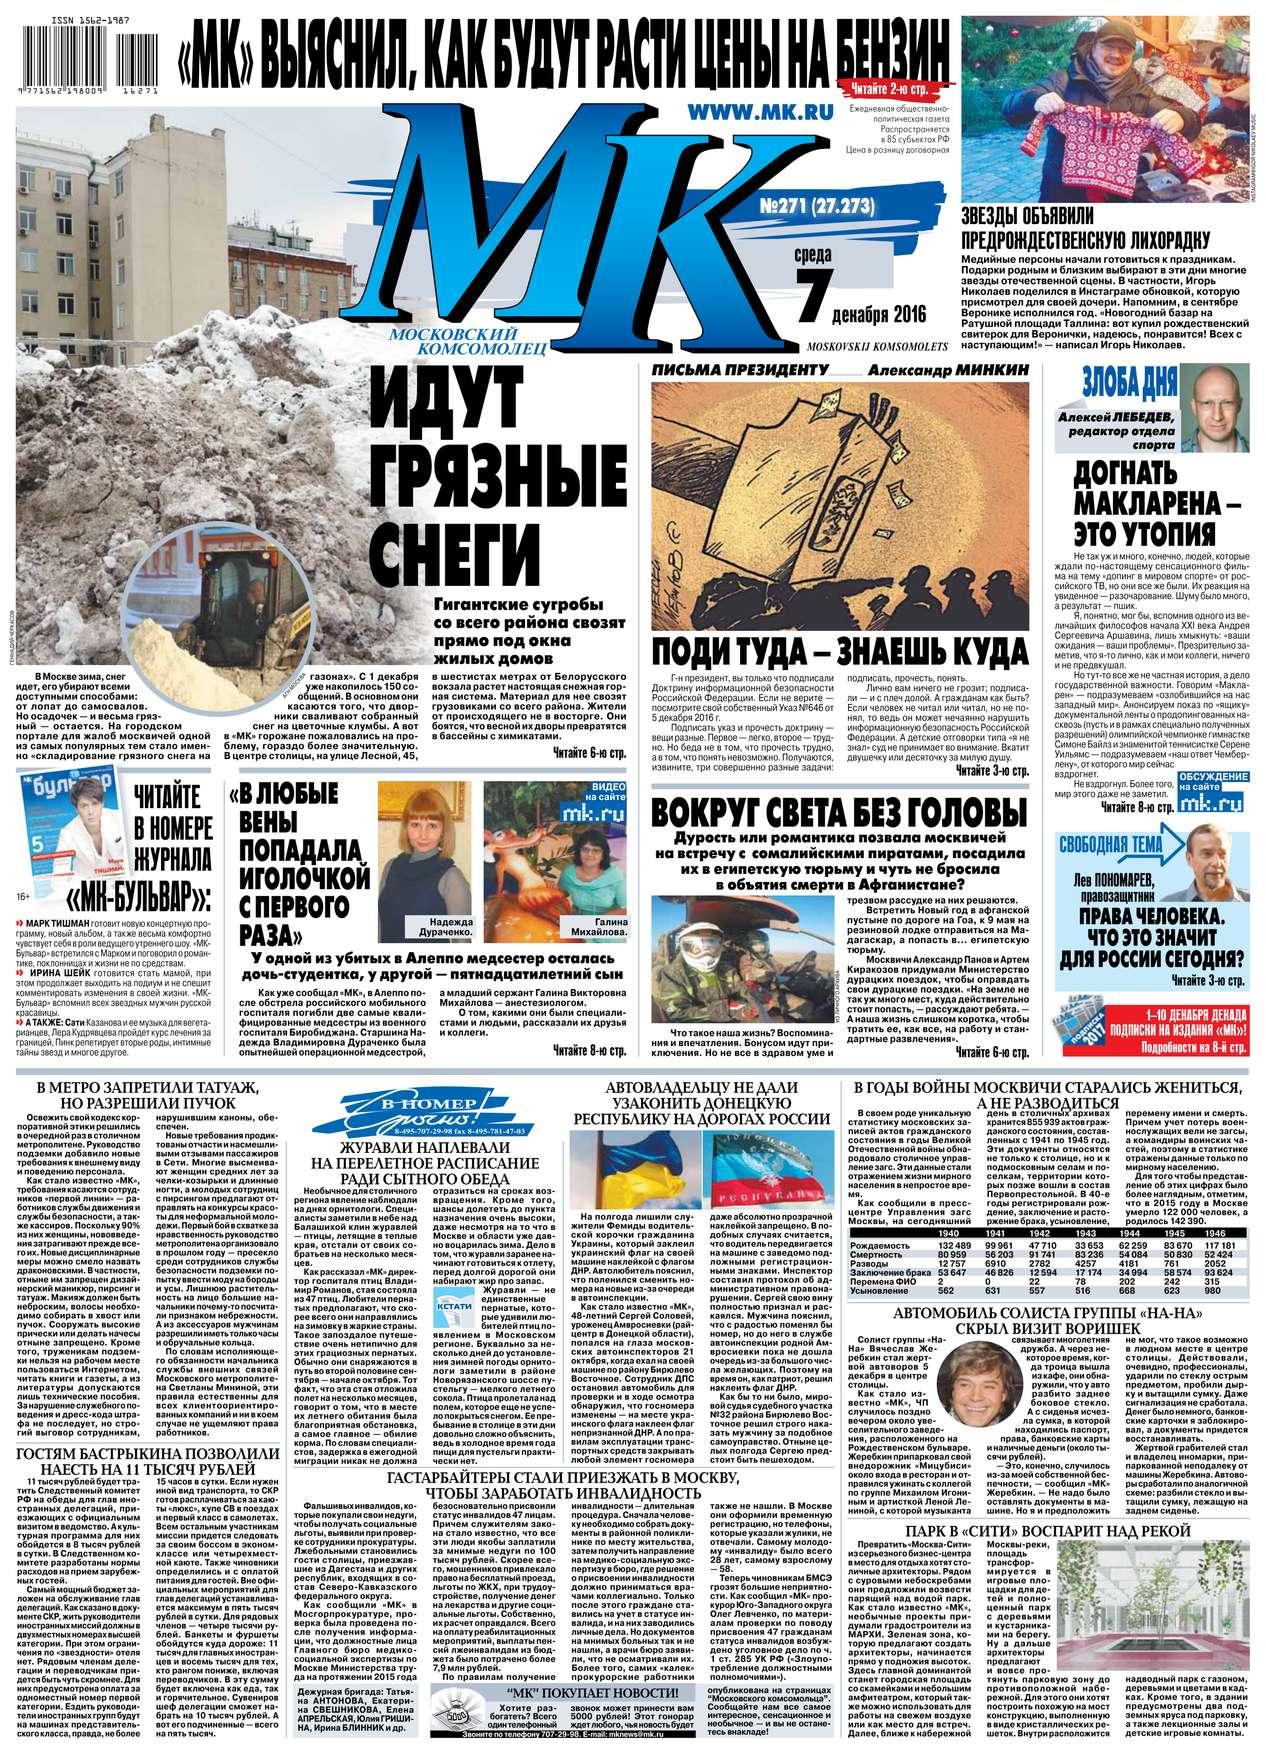 Редакция газеты MK Moskovskii Komsomolets МК Московский комсомолец 271-2016 drill chuck k72 160 four jaw independent chuck collet chuck